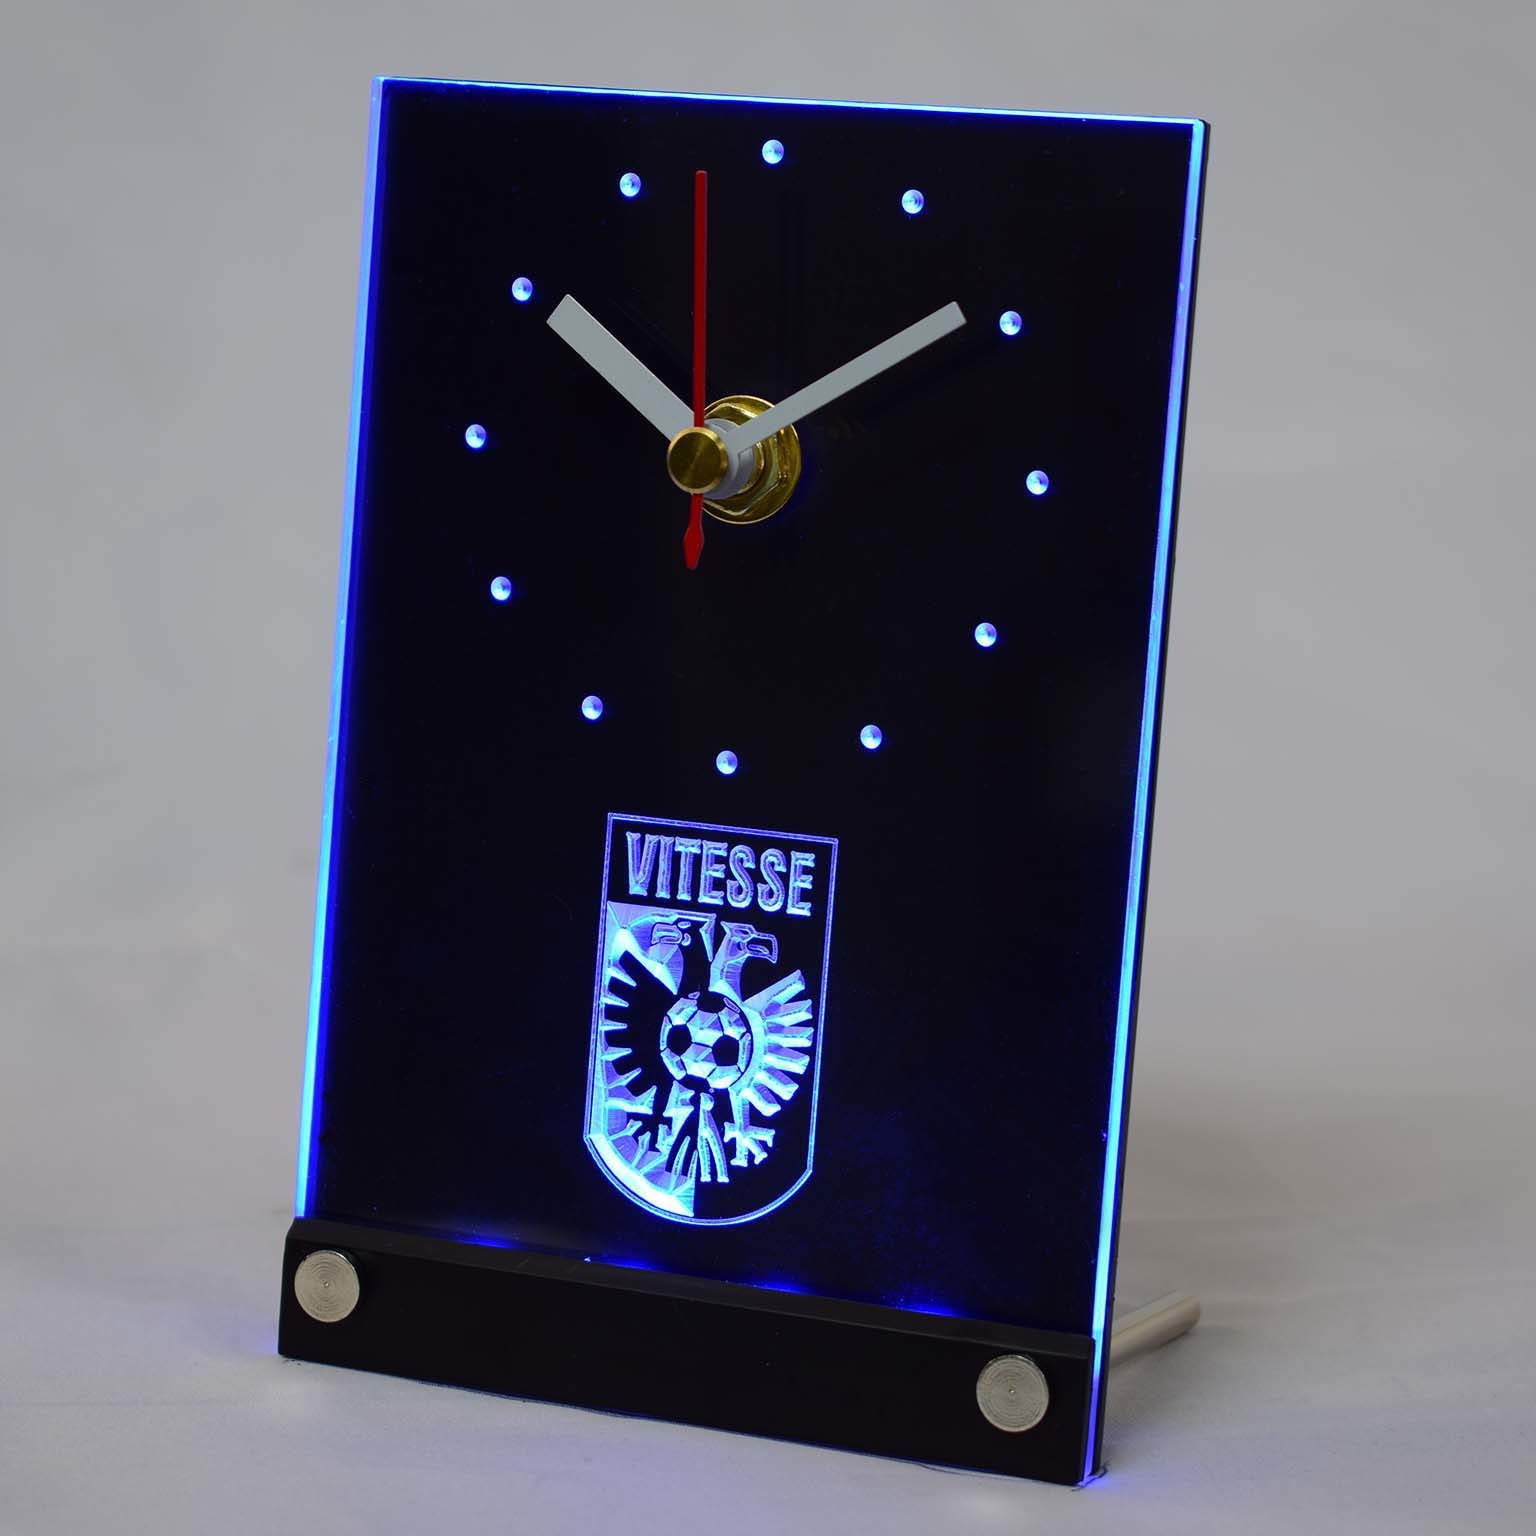 Tnc1009 Vitesse Arnhem Stichting Betaald Voetbal néerlandais Eredivisie 3D LED Table horloge de bureau